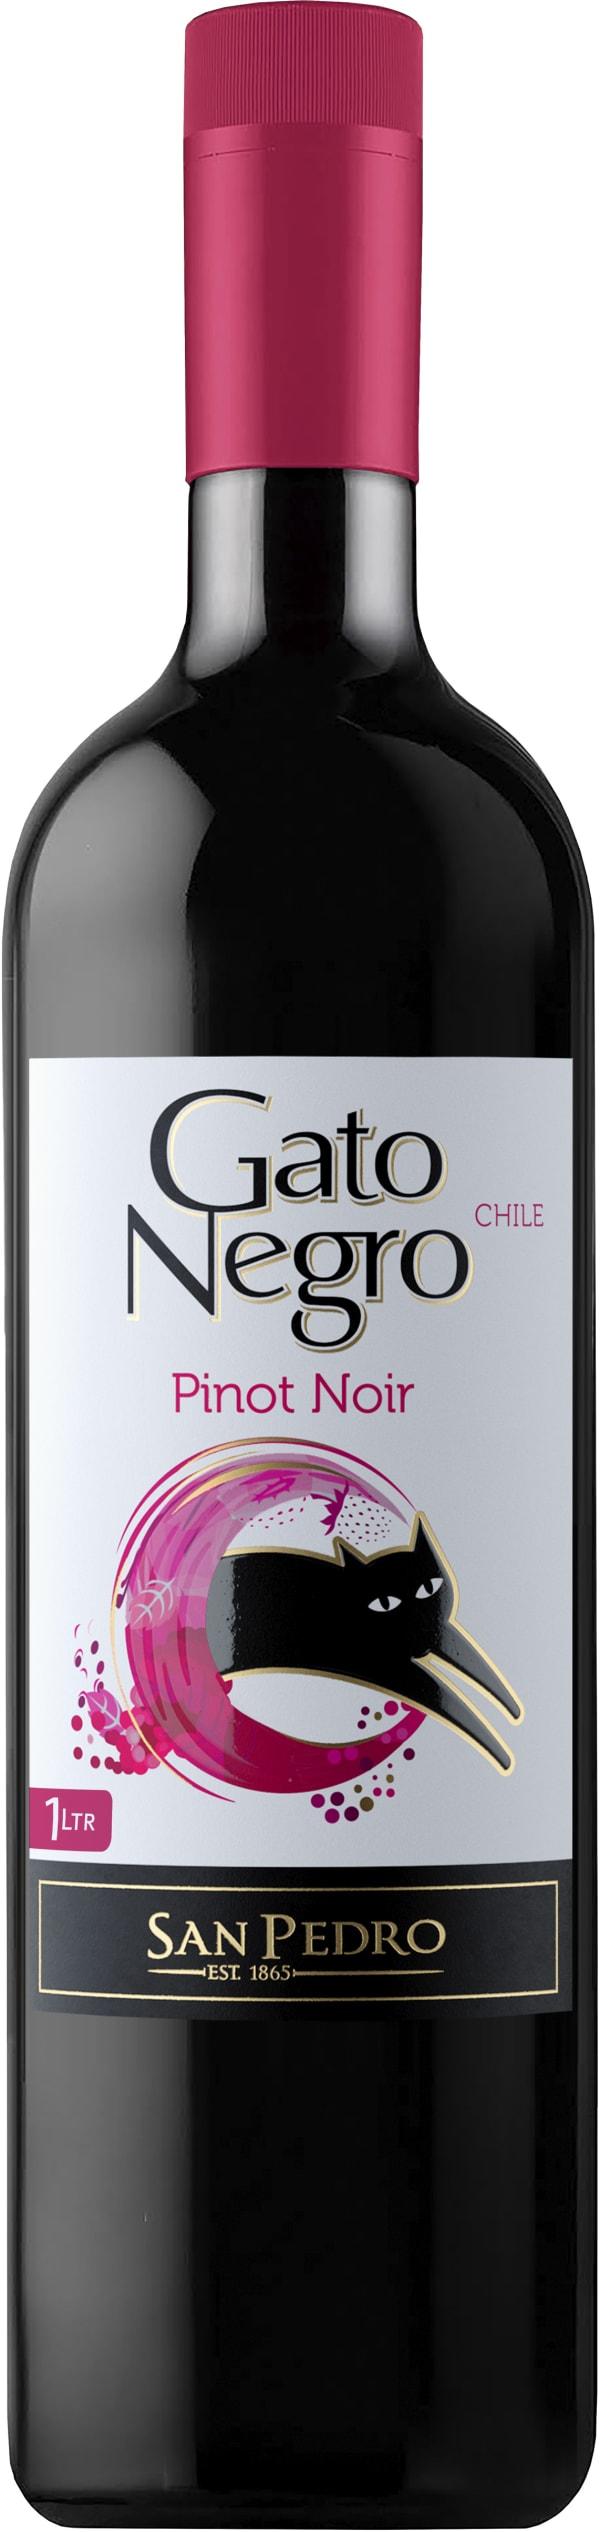 Gato Negro Pinot Noir 2015 plastflaska